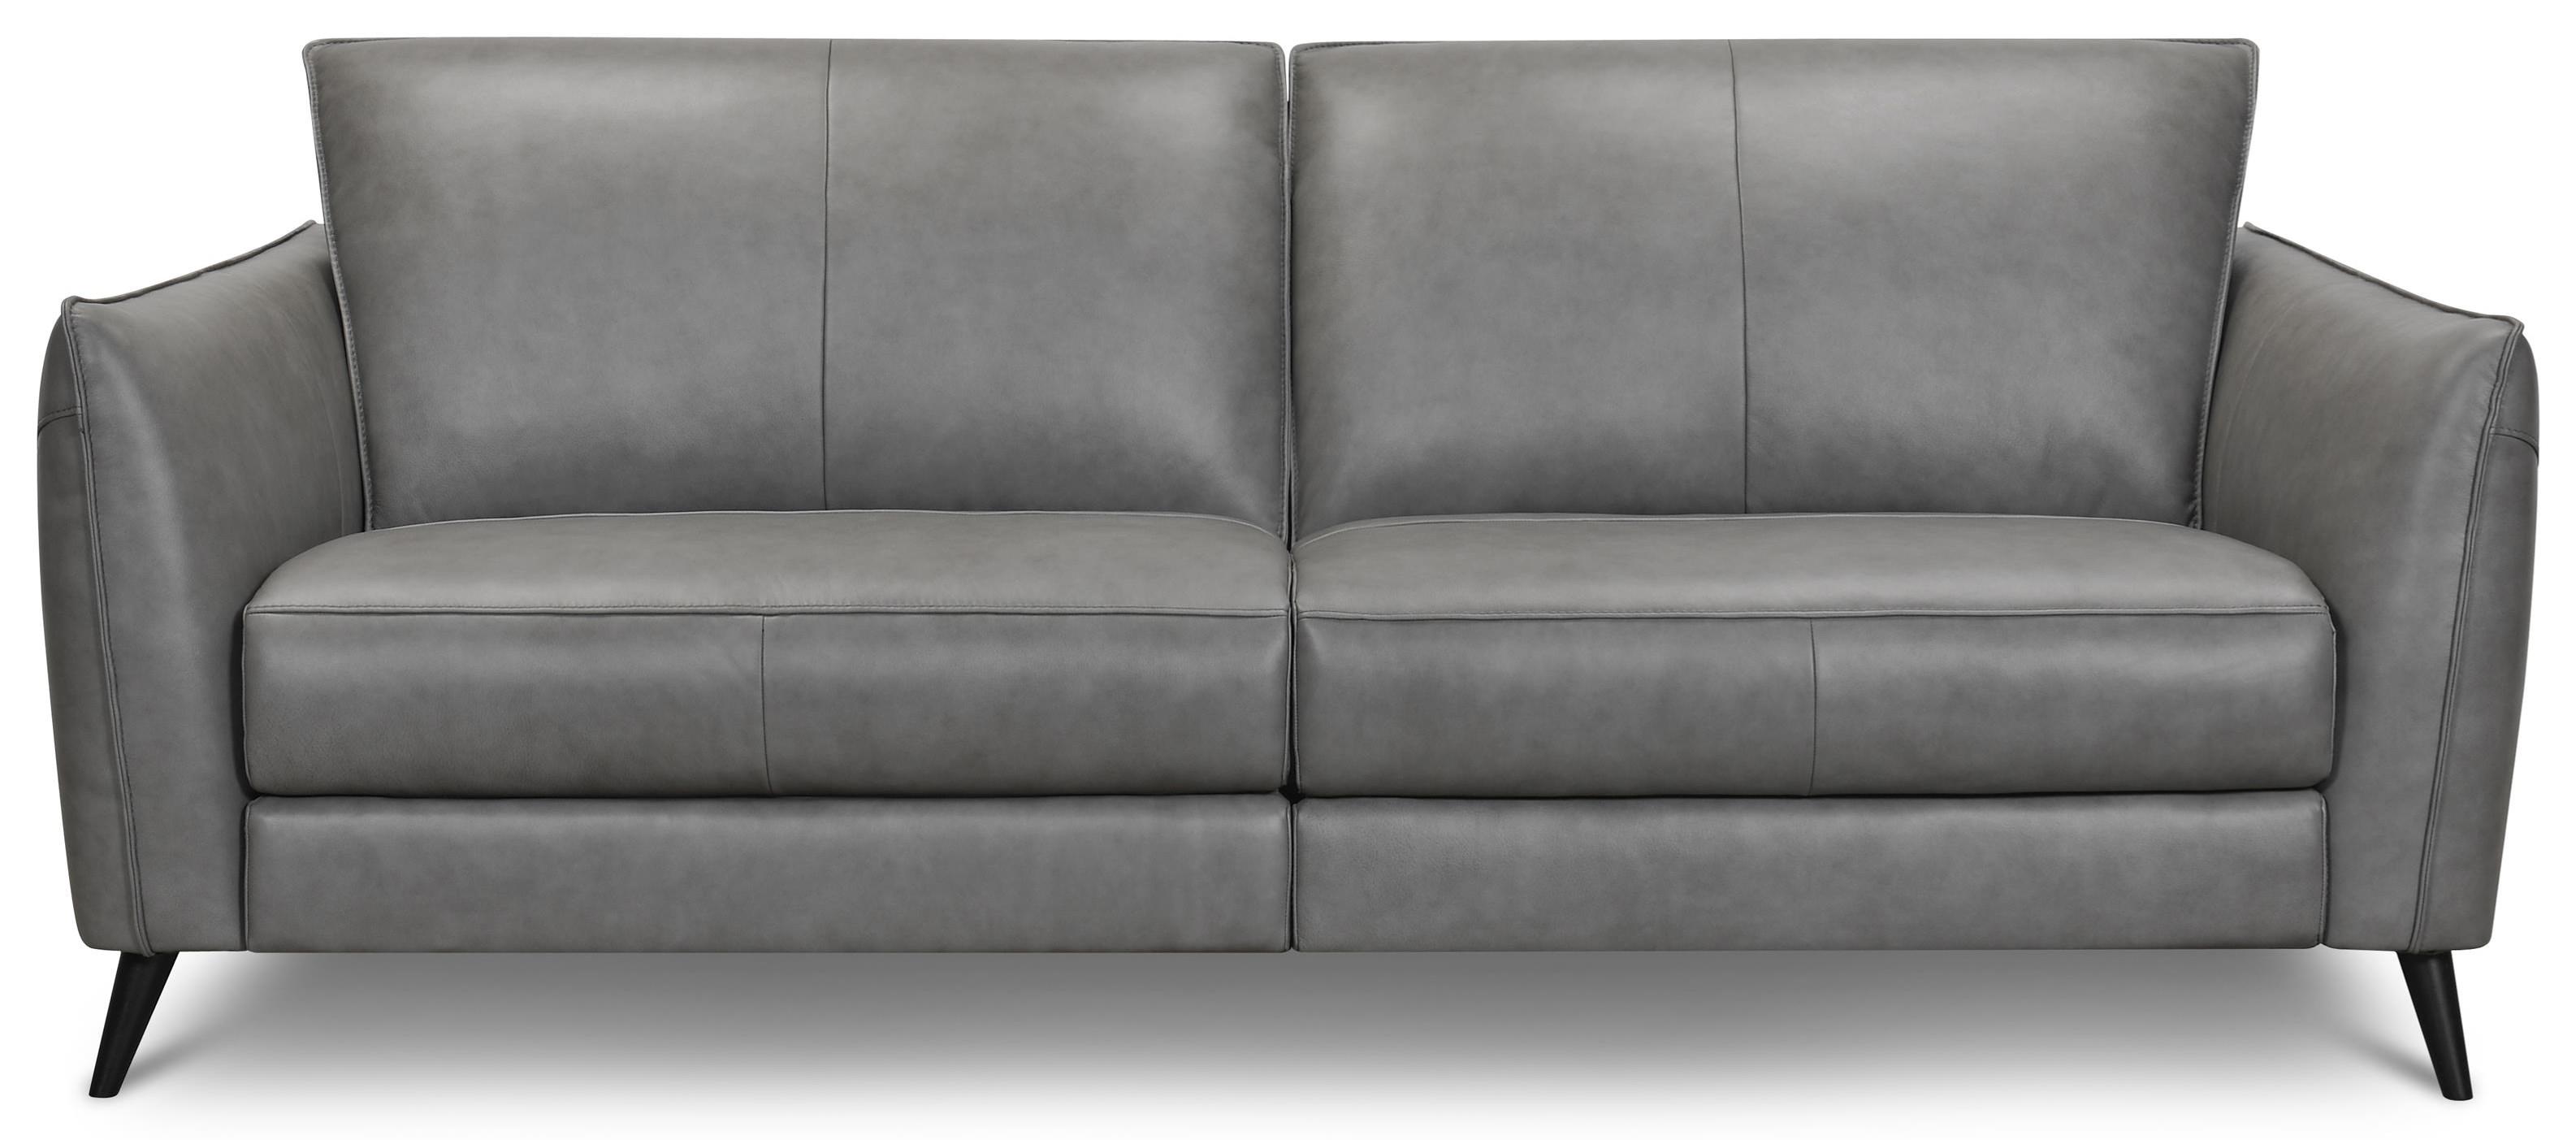 33122 Broderick Power Sofa by Violino at Stoney Creek Furniture